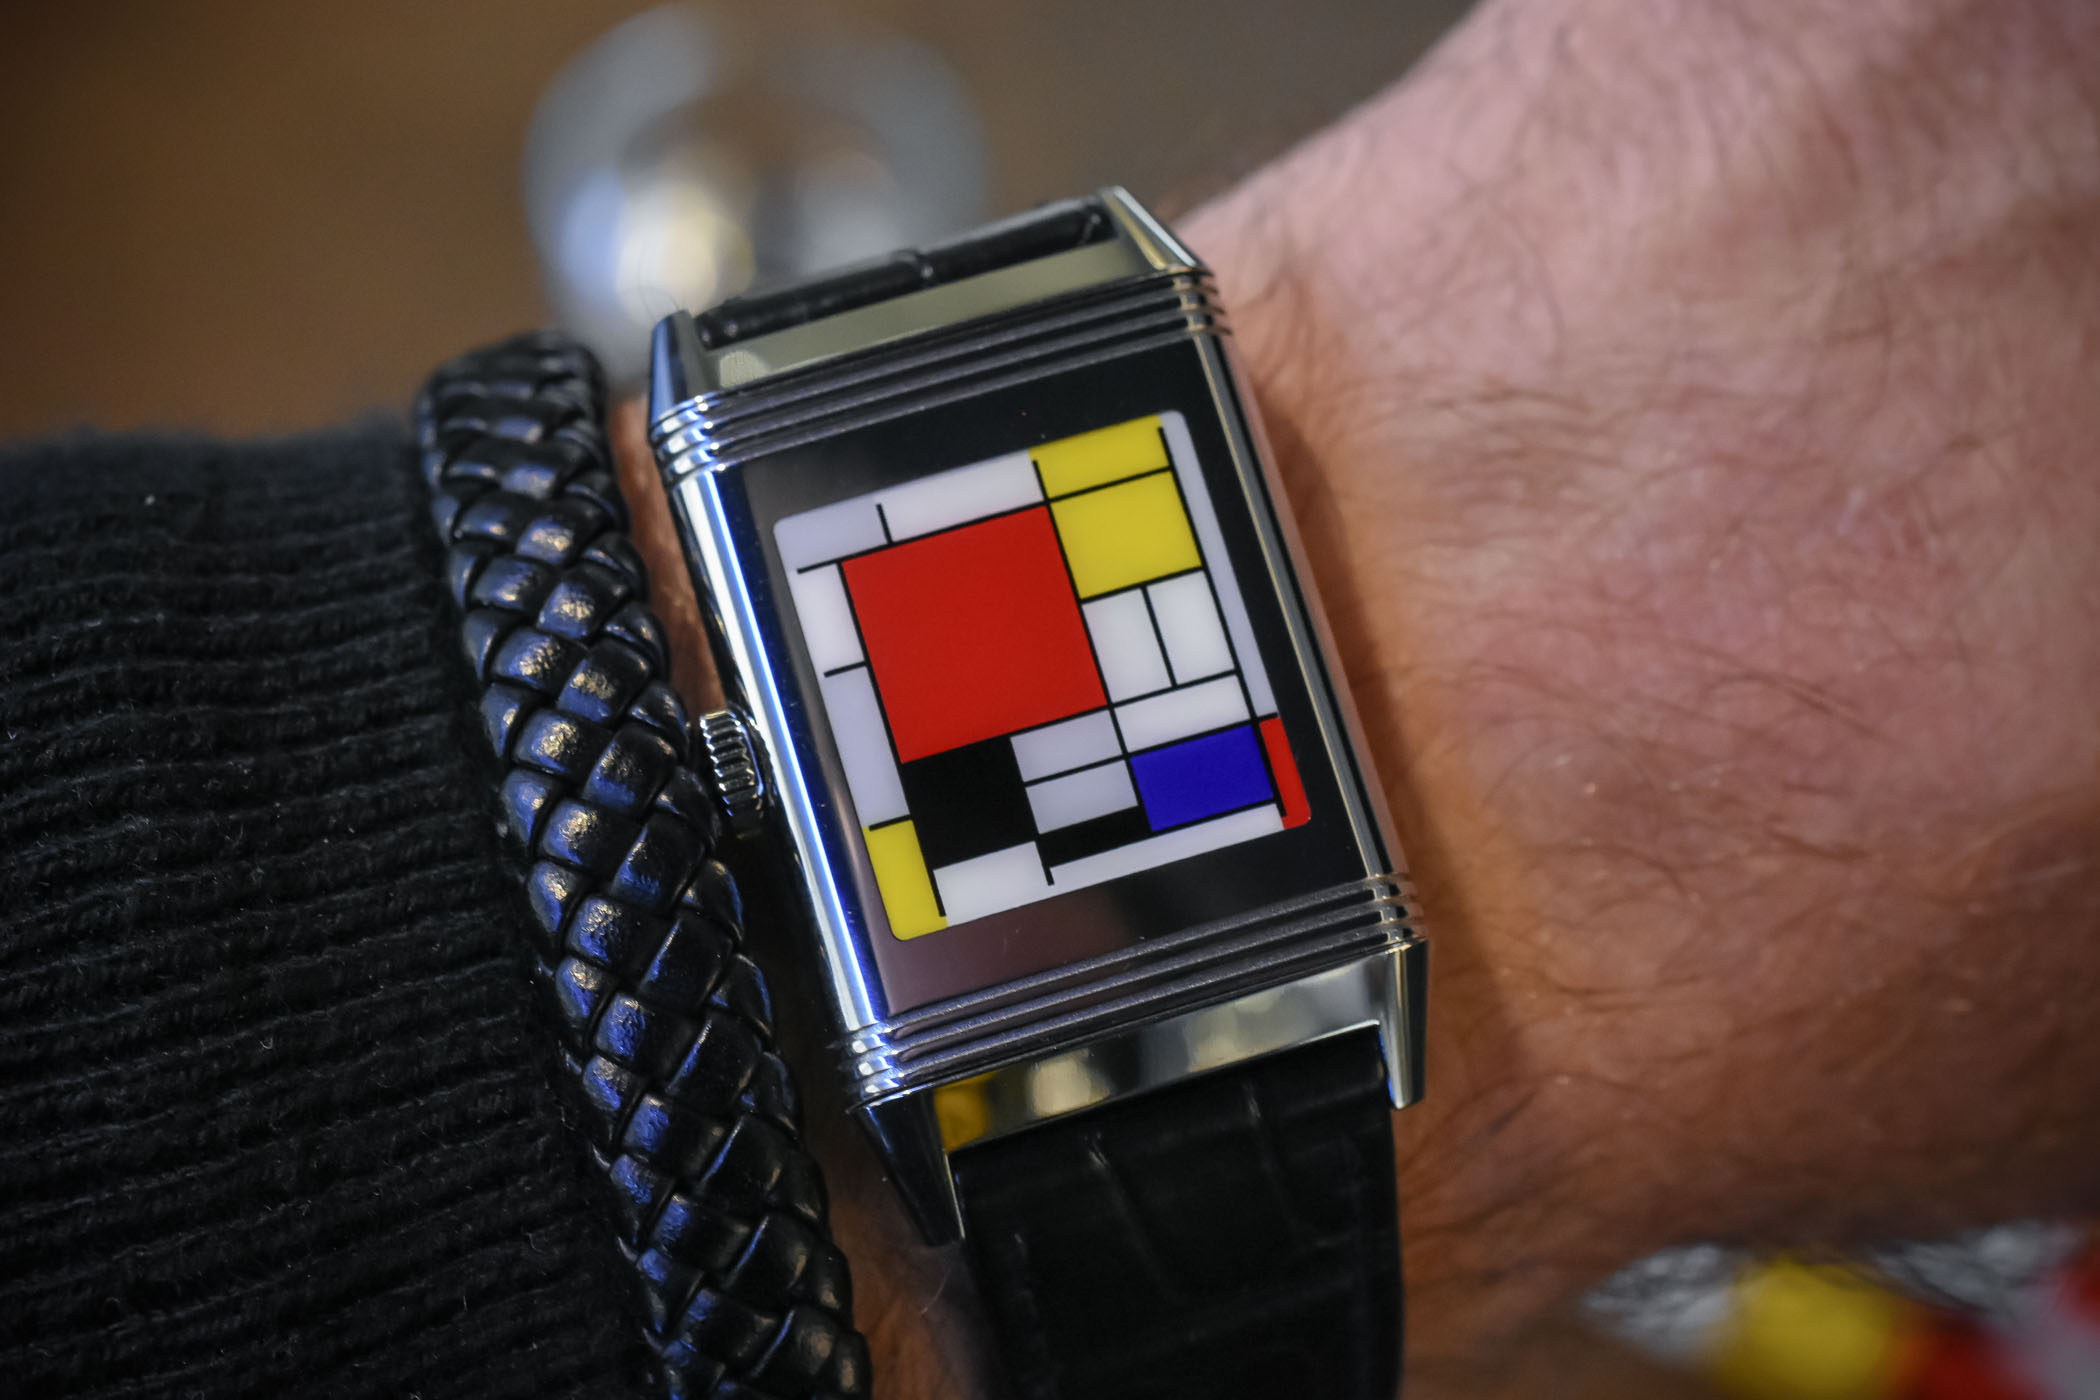 Jaeger-LeCoultre Reverso tribute to Piet Mondriaan De Stijl 100 years Steltman